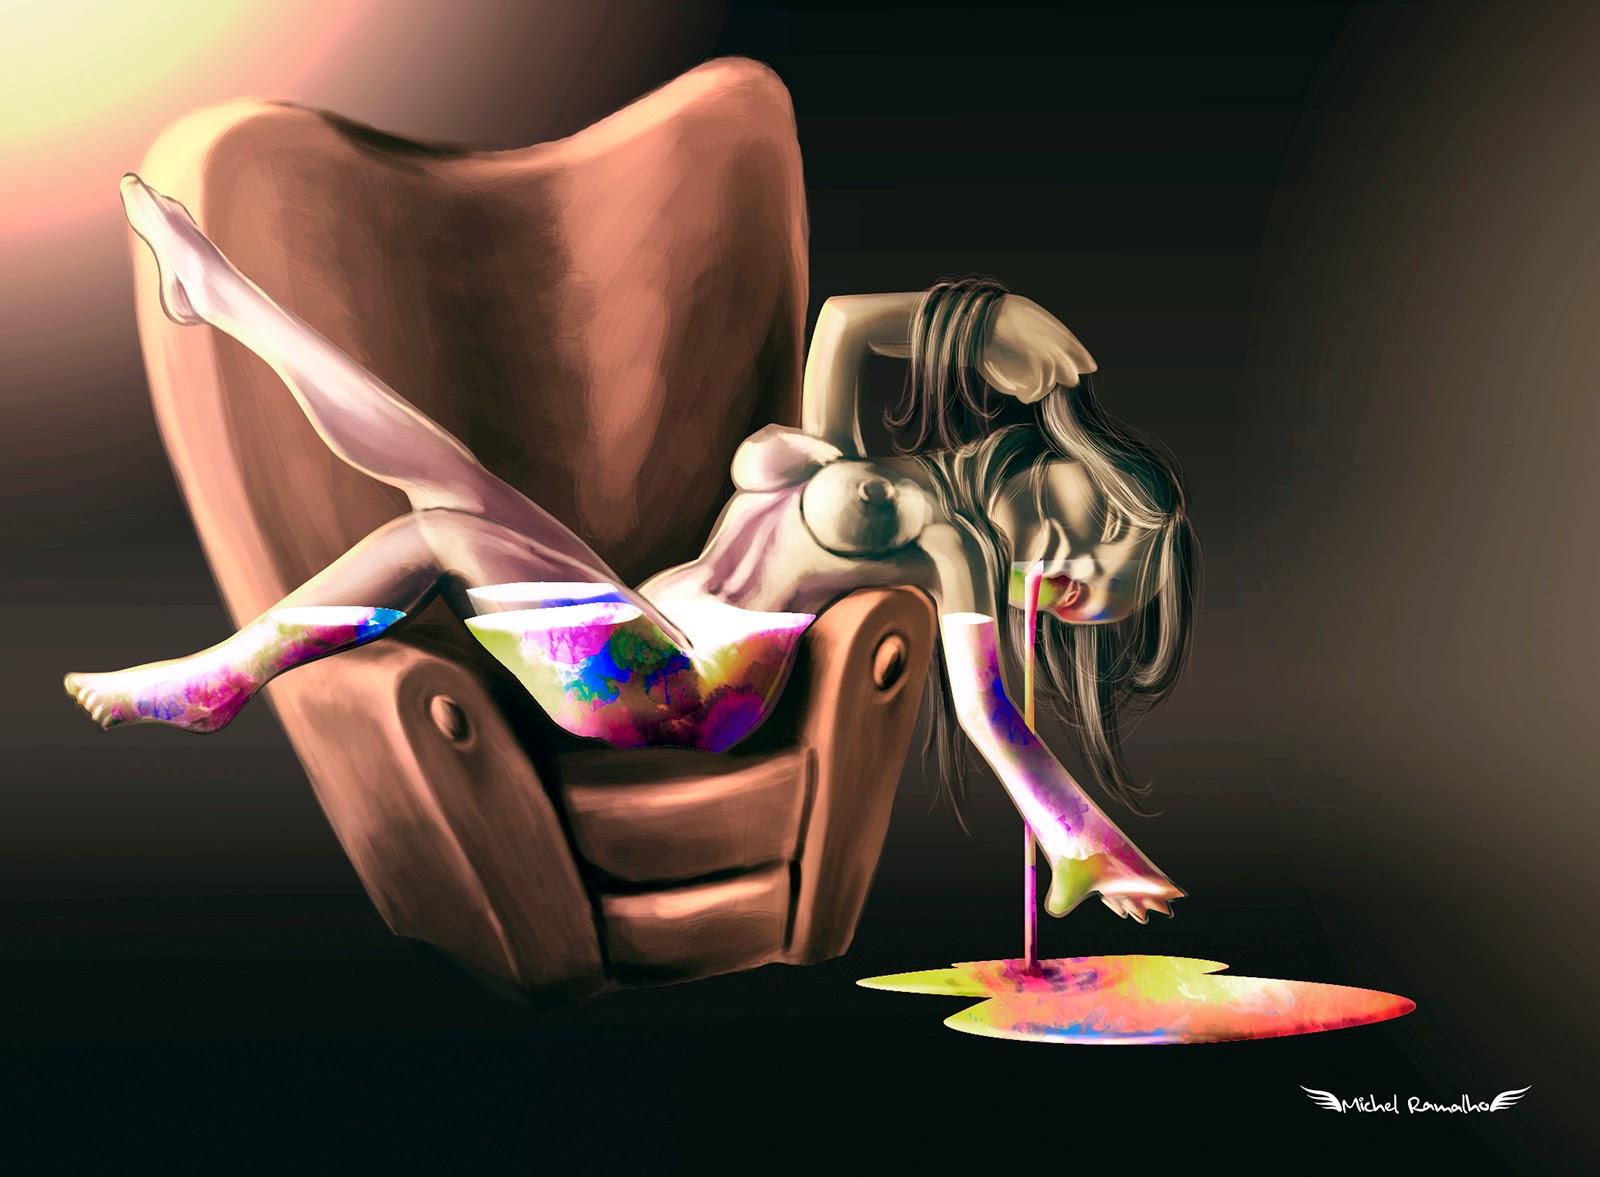 Arte Transbordante - Pin Up Digital Illustration - Michel Ramalho